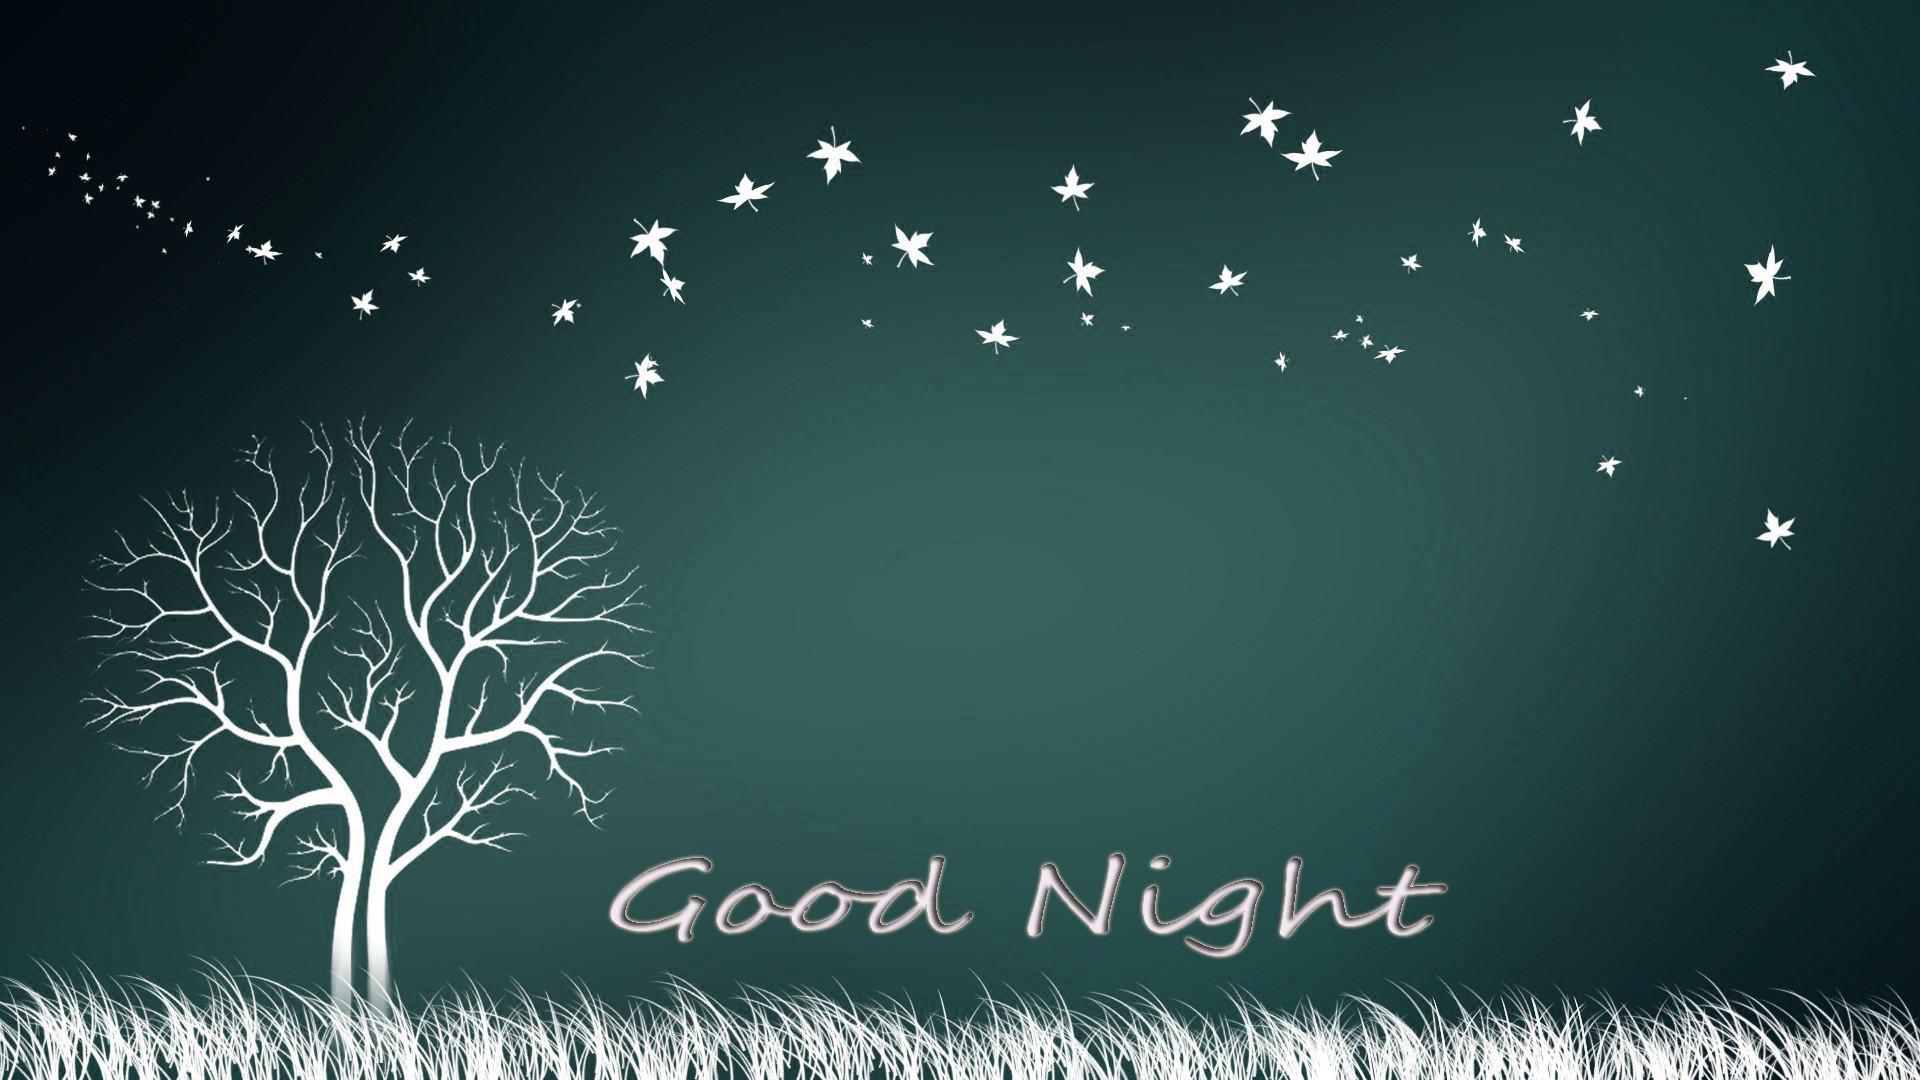 Good Night Wallpapers ① Wallpapertag